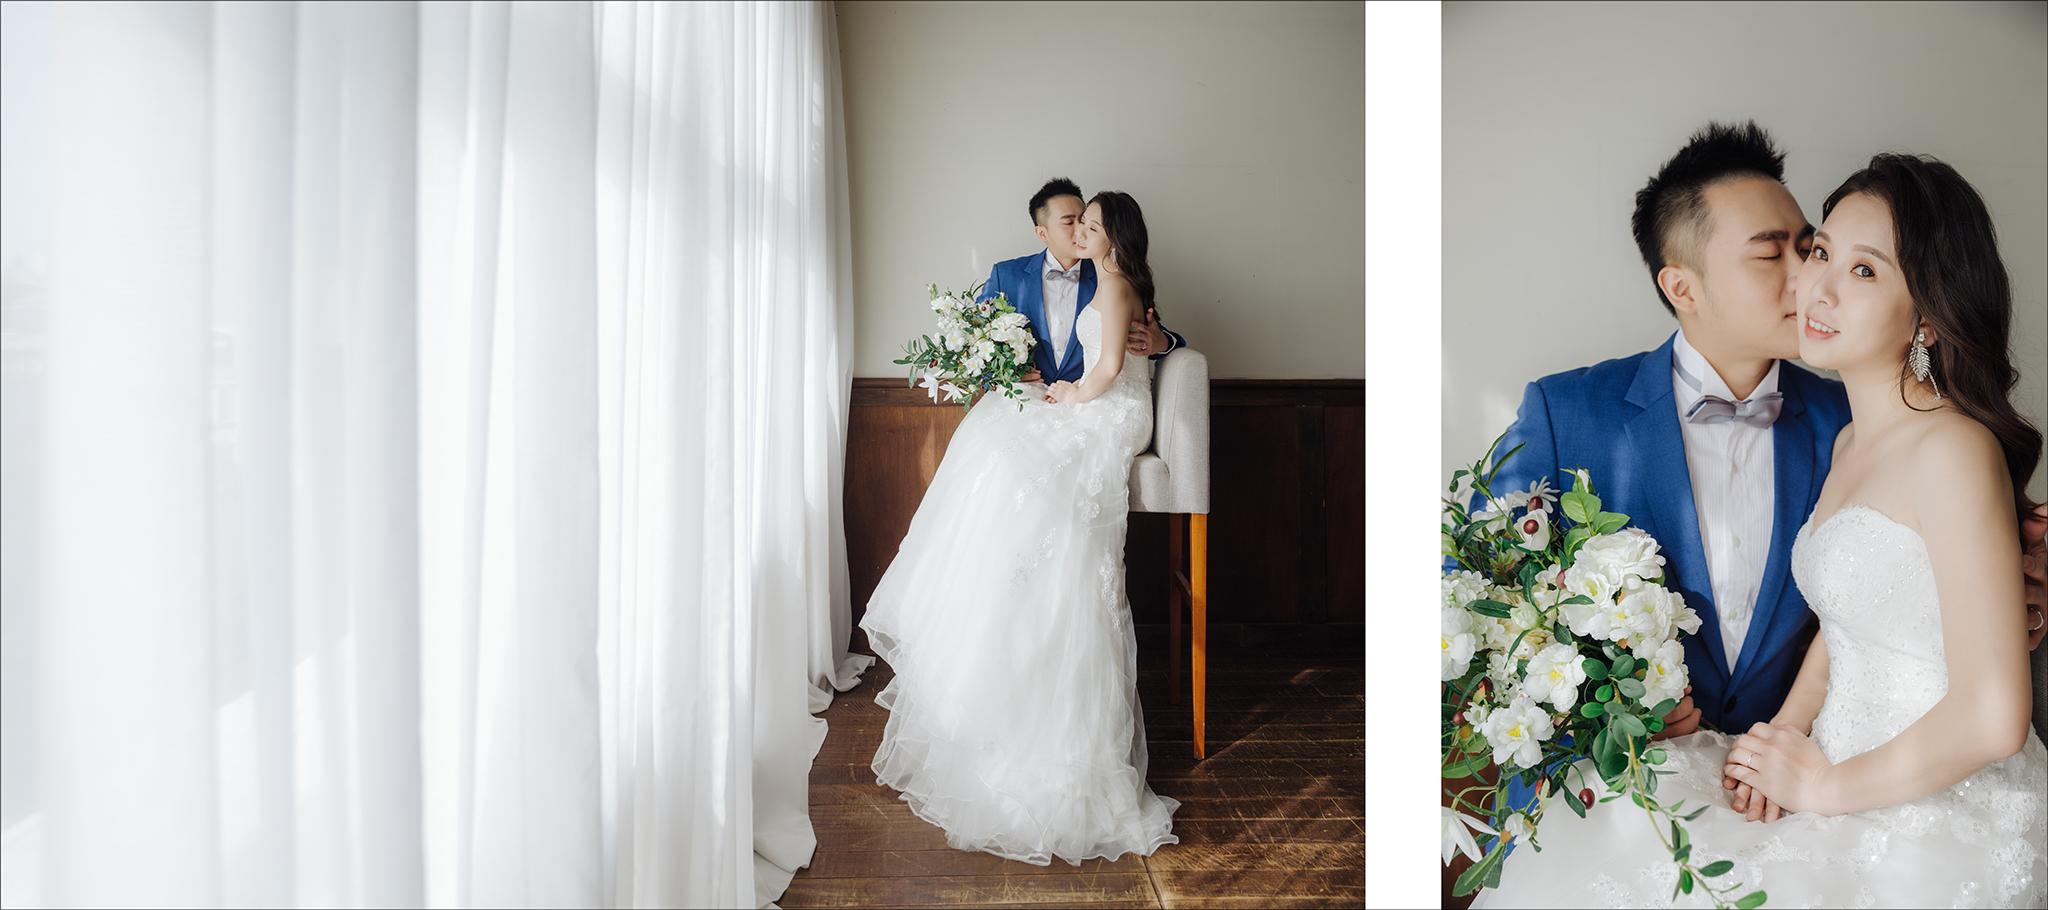 49599268736 6eefe79deb o - 【自助婚紗】+啟安&虹虹+